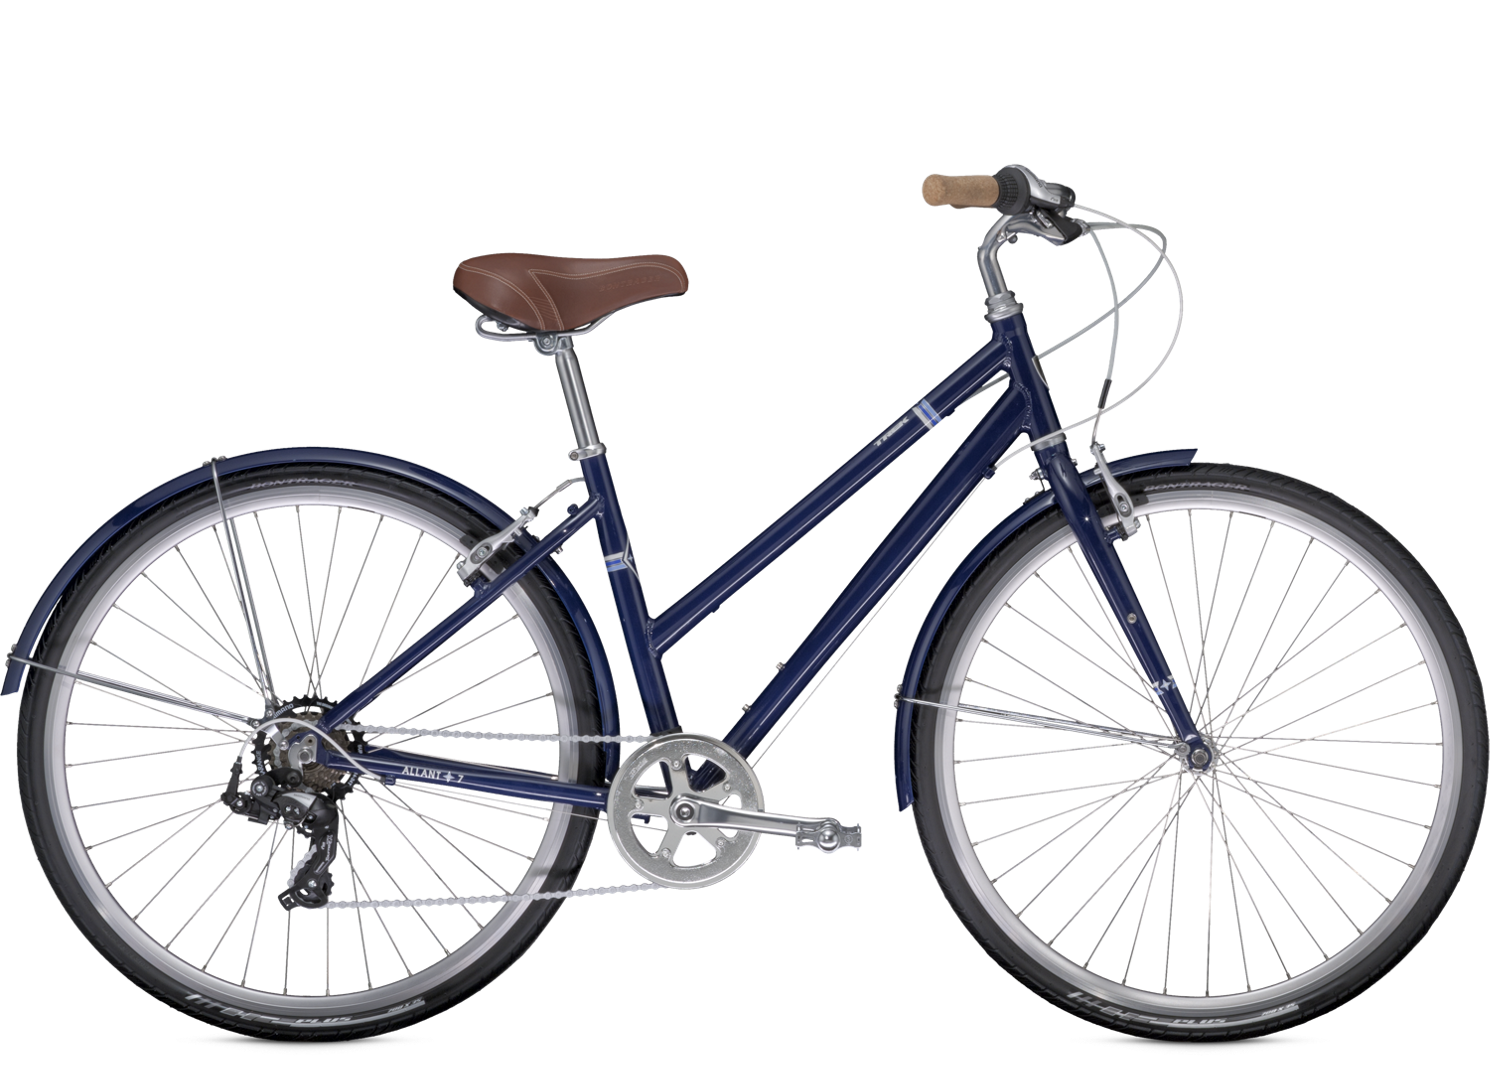 Clipart bicycle gym bike. Allant wsd trek a